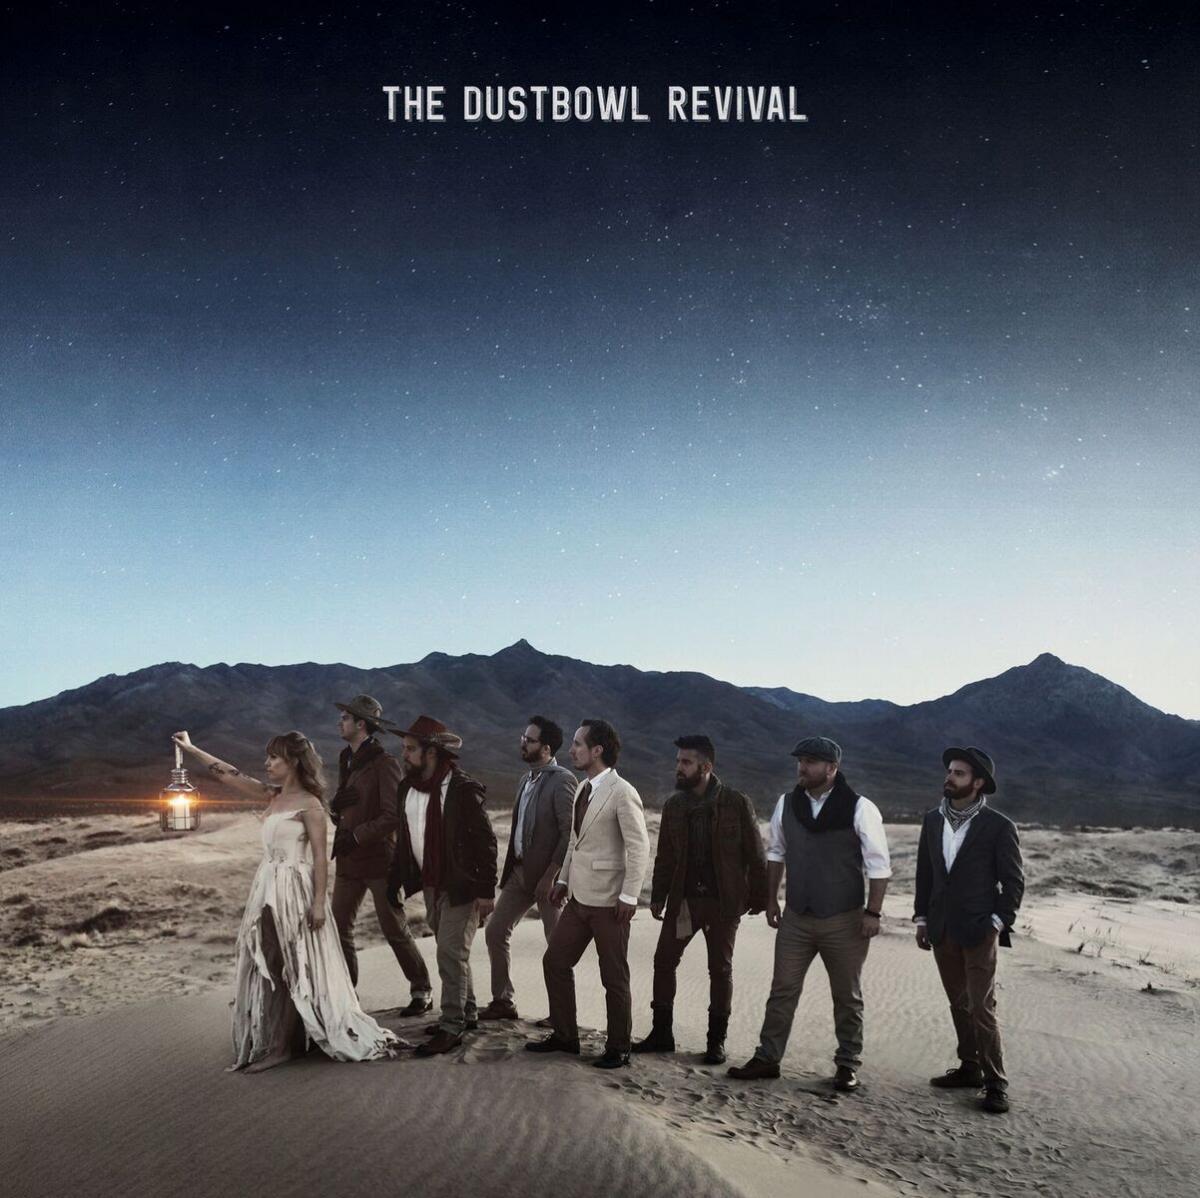 Dustbowl Revival